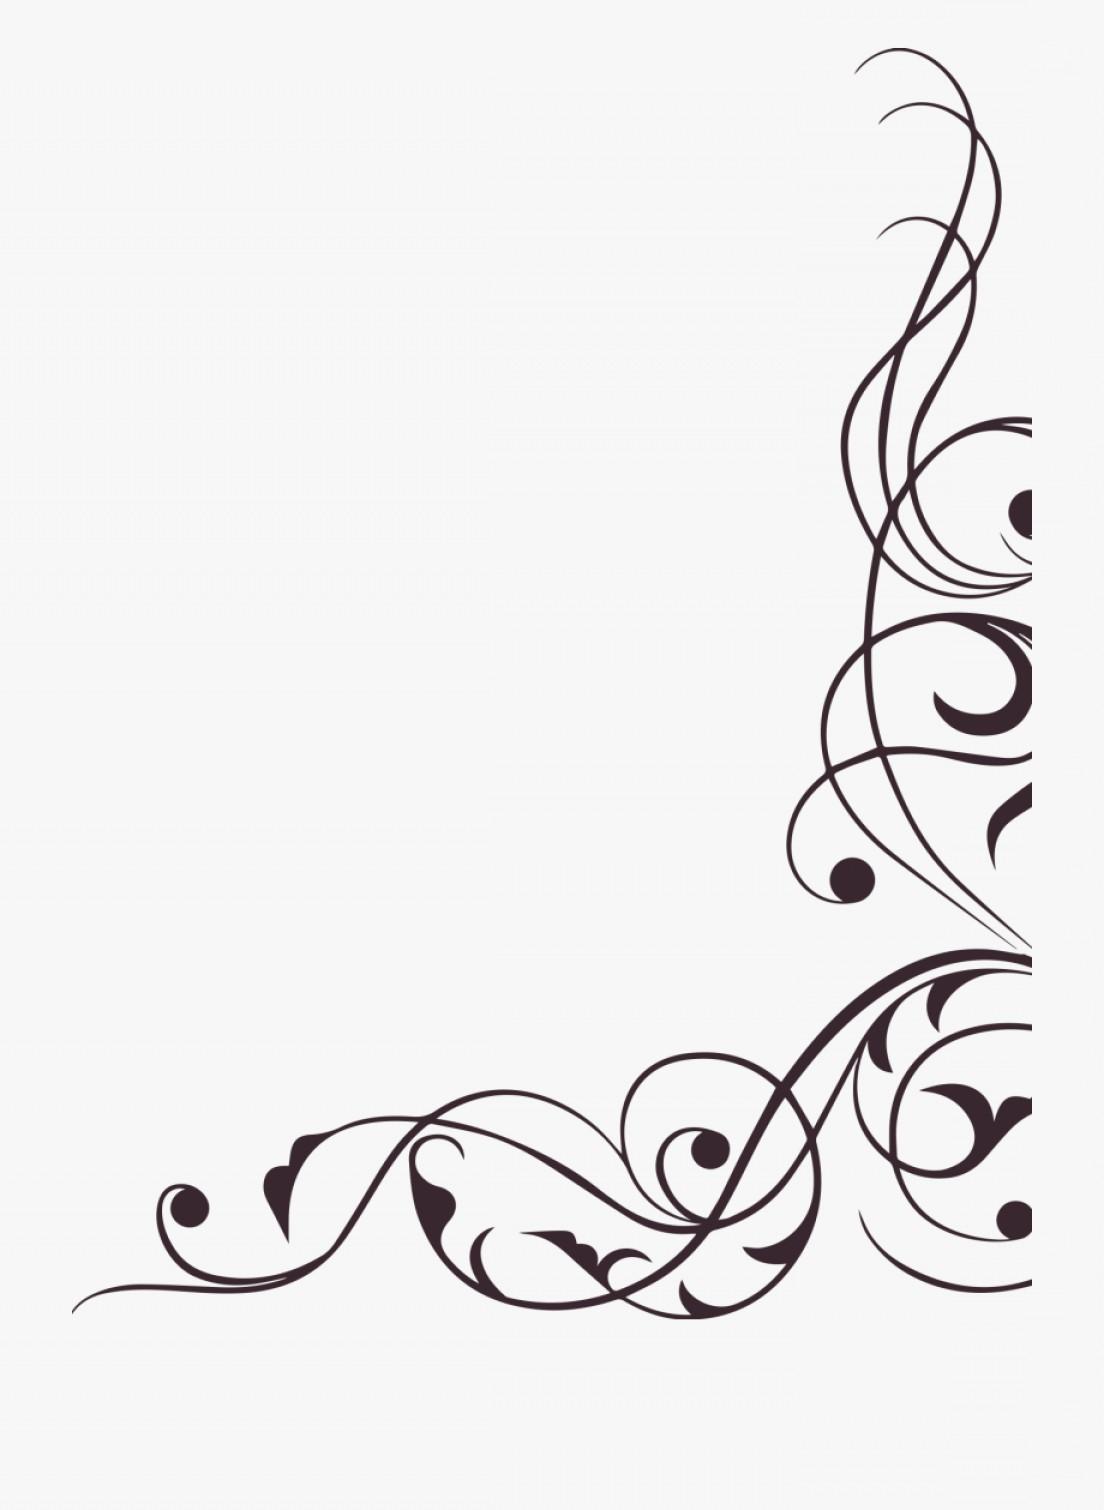 Mxwmofloral Clipart Swirl Clip Art Designs Transparent.